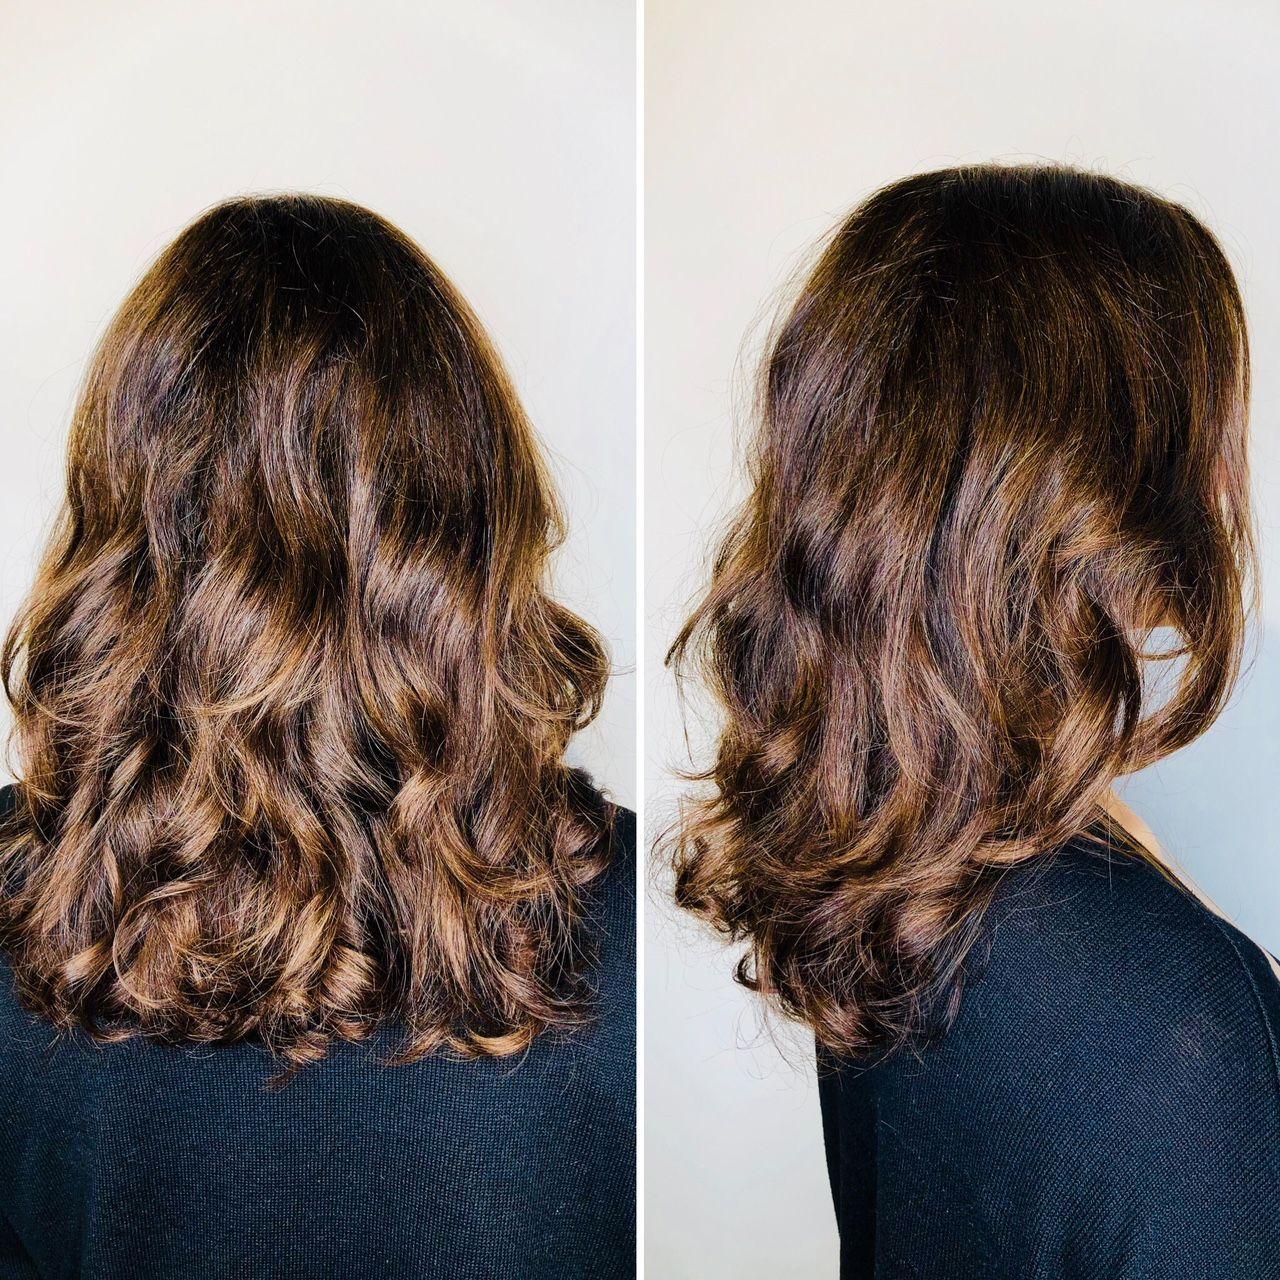 Best Digital Perm Salon In Melbourne Blog Japanese Hair Salon Art Noise Digital Perm Curled Hairstyles For Medium Hair Permed Hairstyles